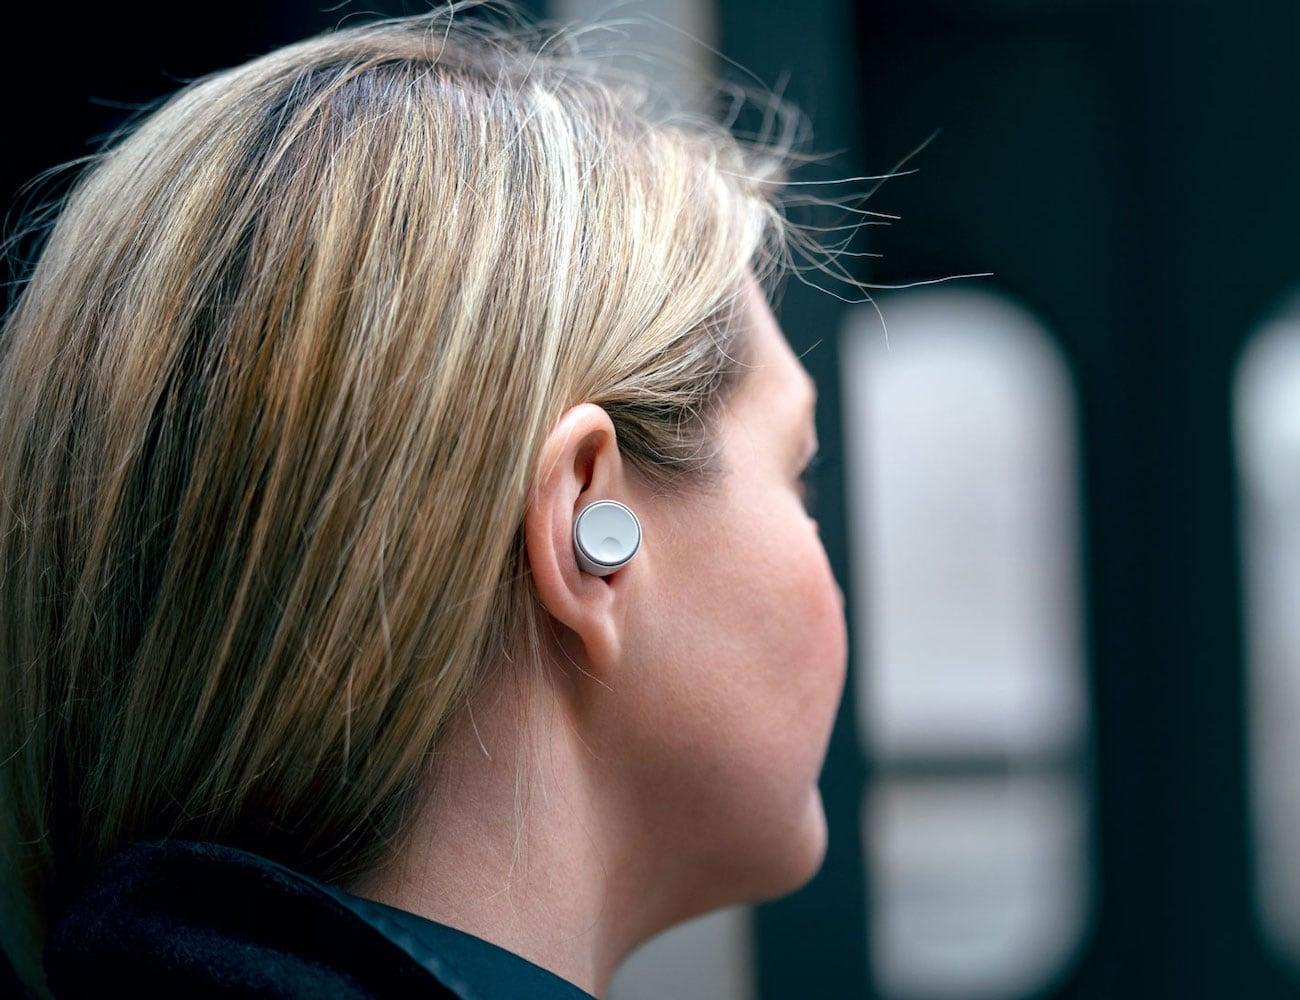 Cambridge Audio Melomania 1 Bluetooth Wireless Earphones